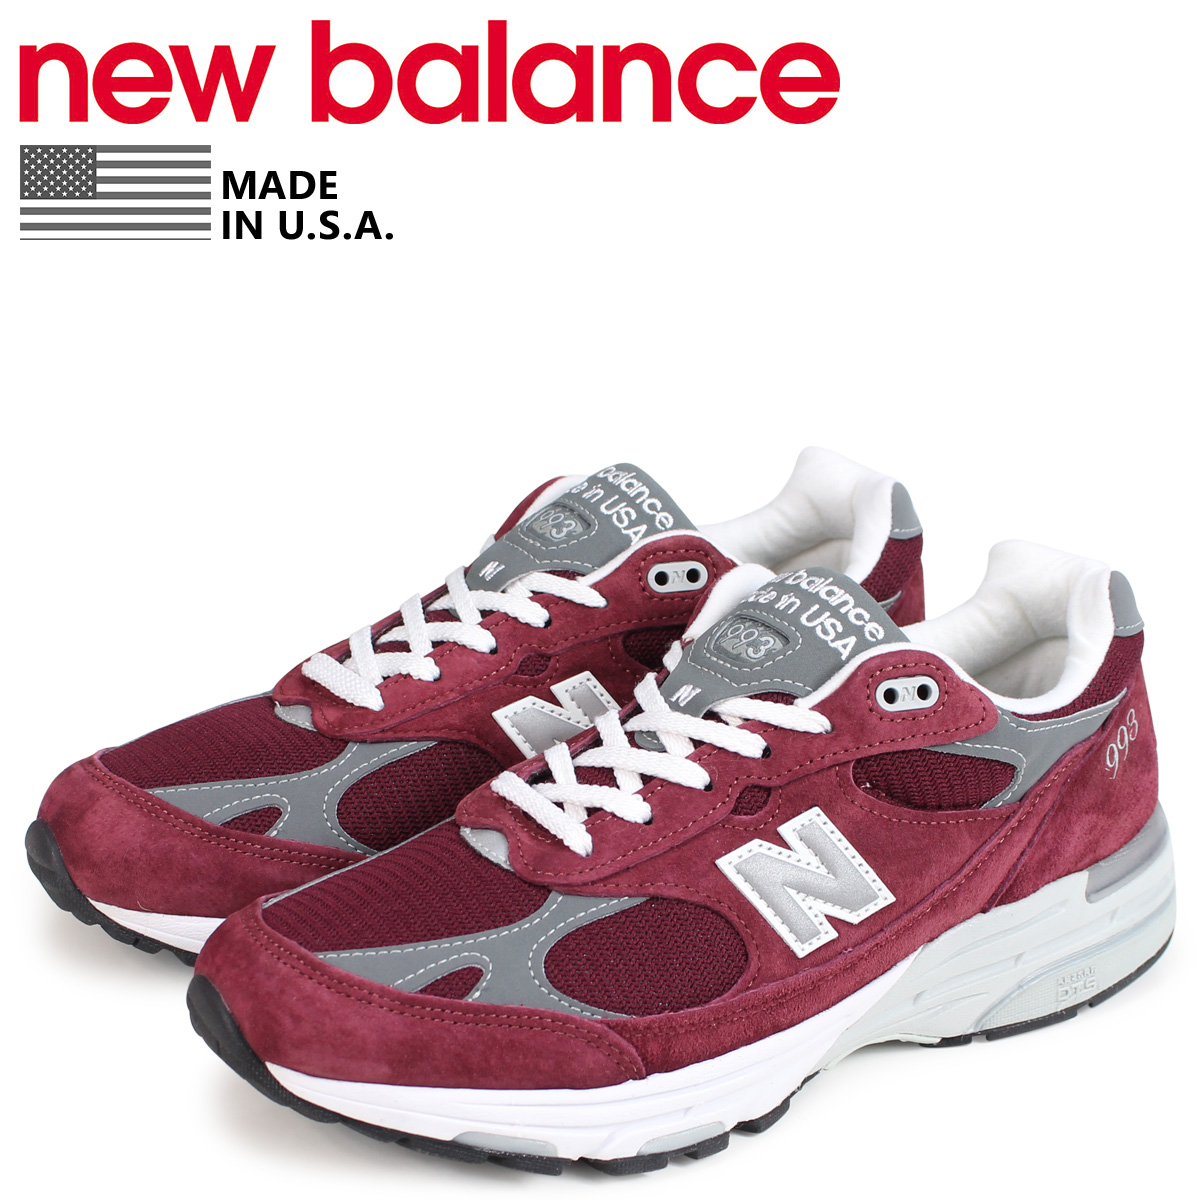 uk availability 9055c 663e9 new balance 993 New Balance men sneakers MR993BU D Wise MADE IN USA bar  Gandhi